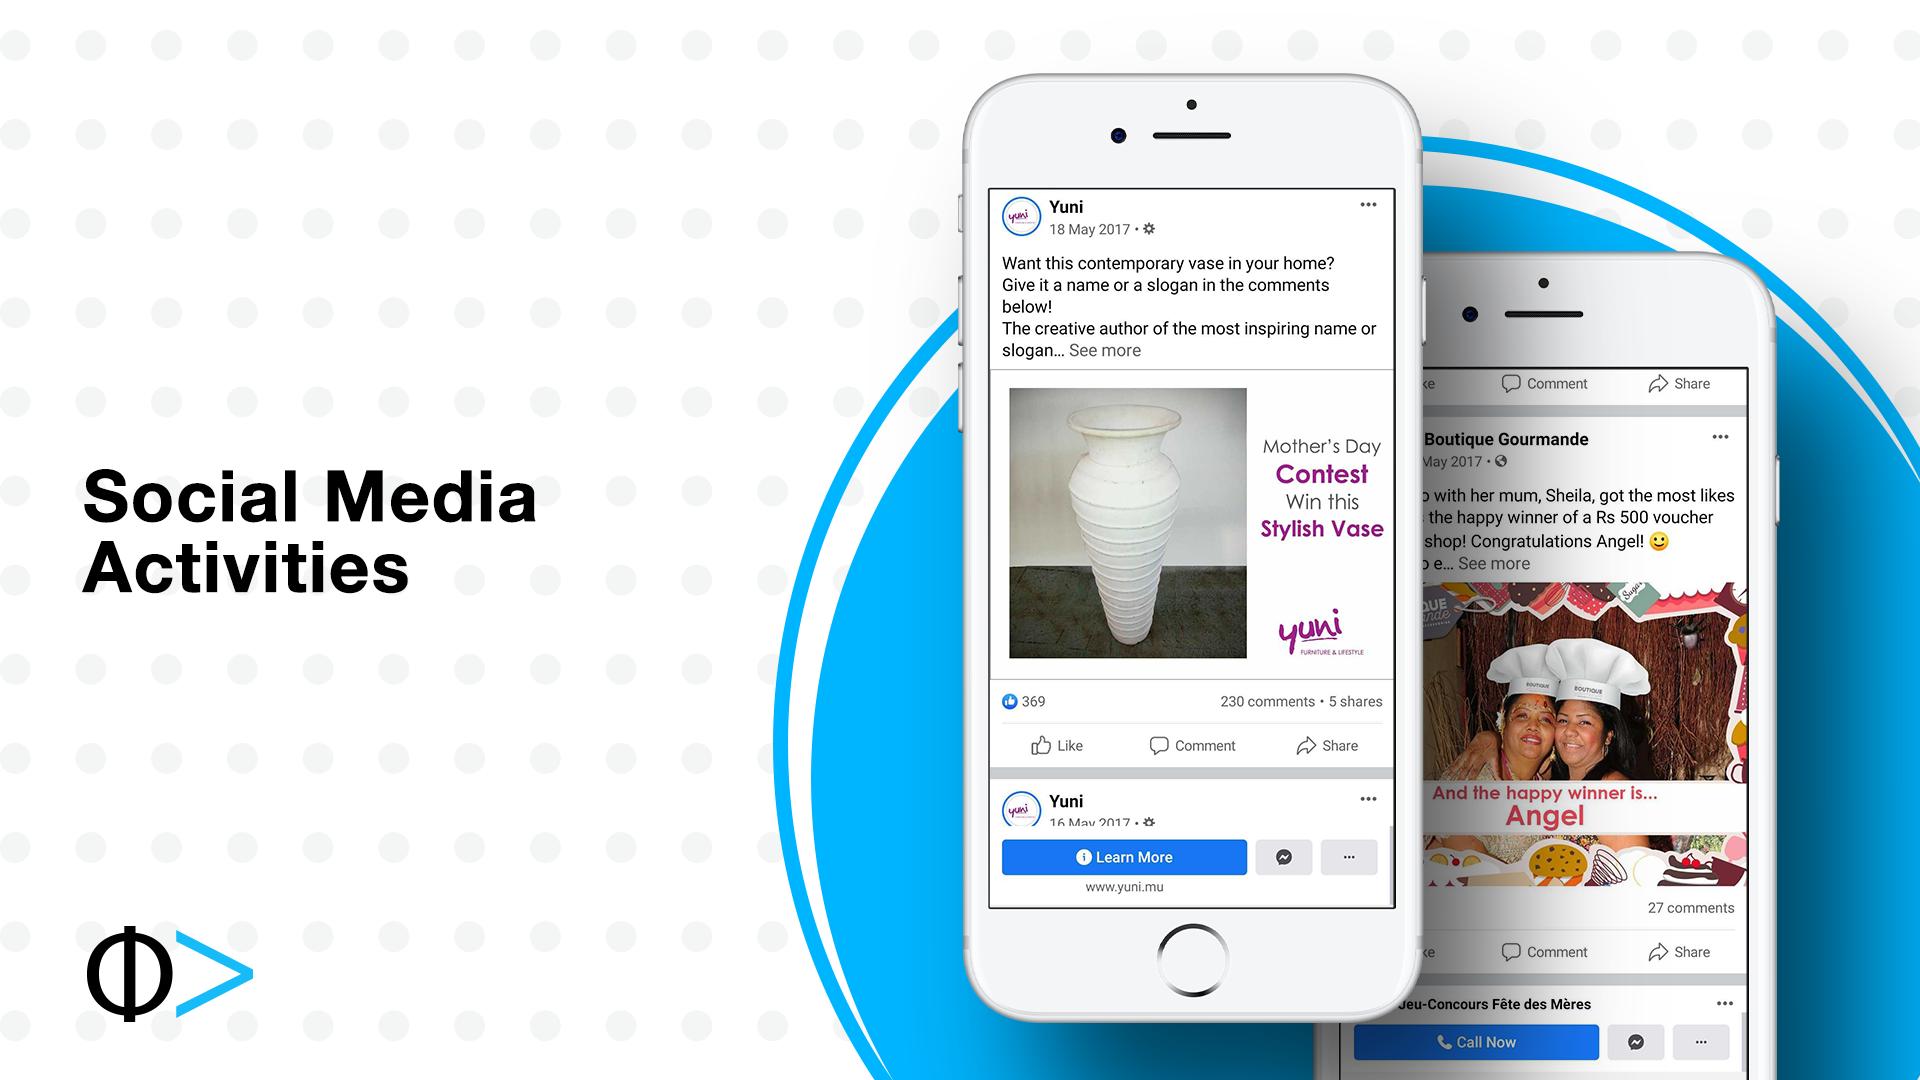 16_social media activities_Blog_template.png